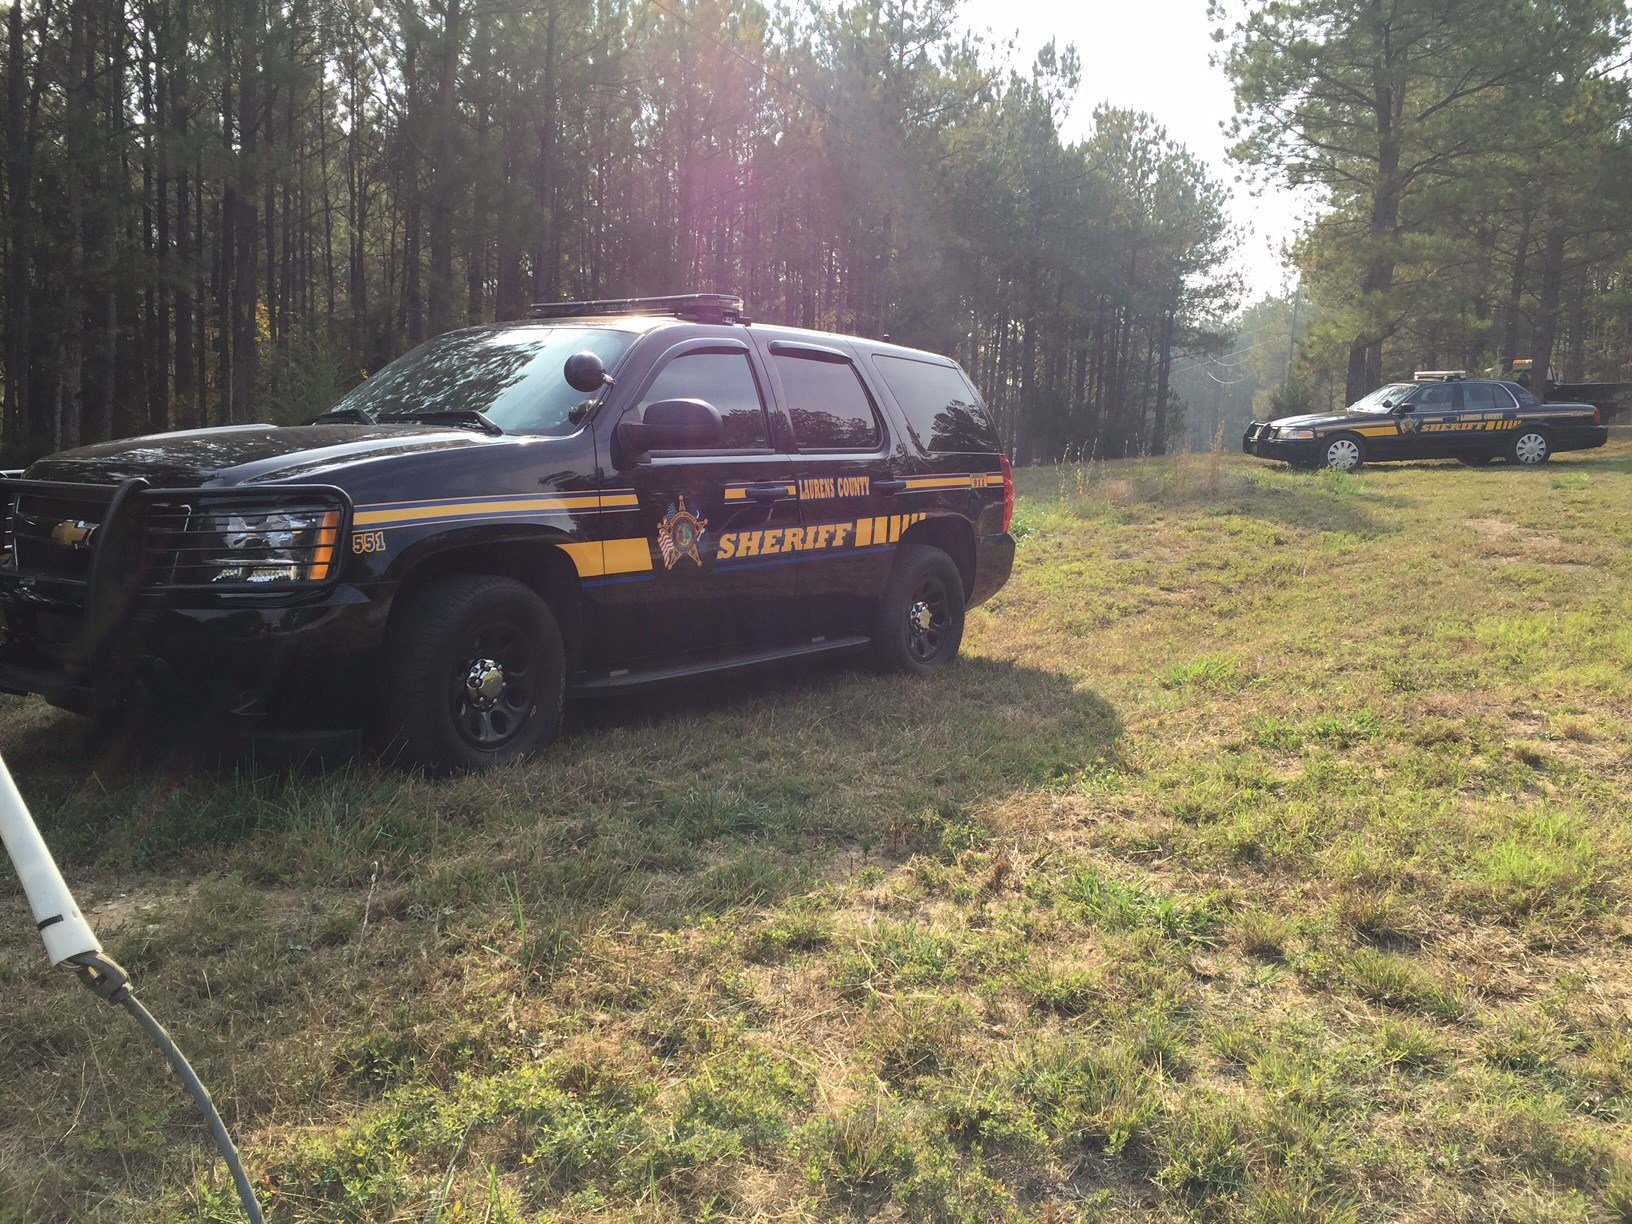 Officials respond to reported Lake Greenwood drowning. (Nov. 11, 2016/FOX Carolina)